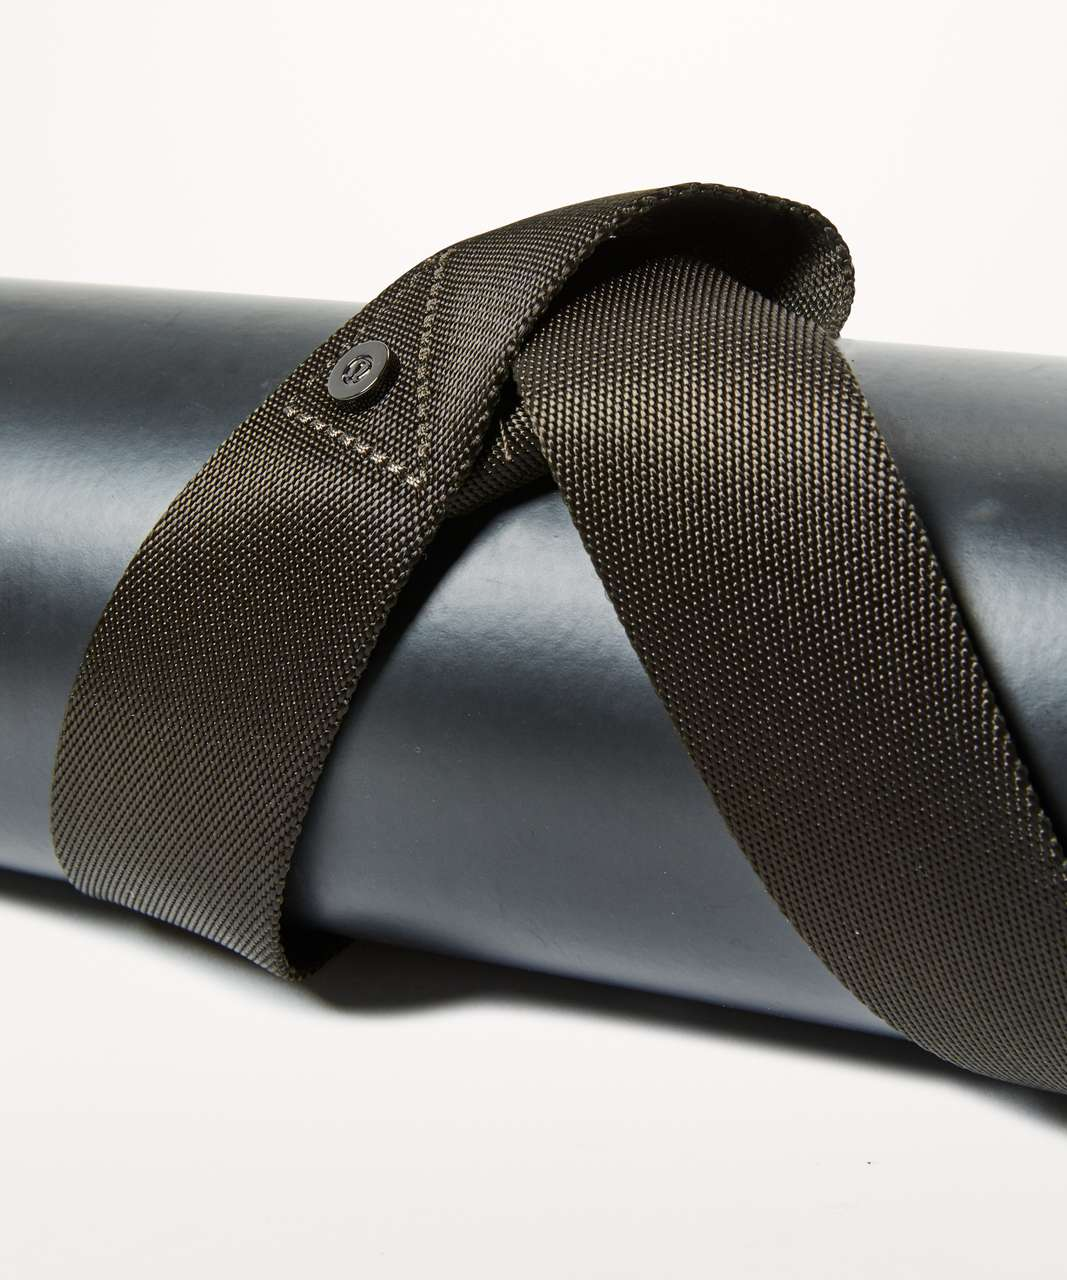 Lululemon Loop It Up Mat Strap - Dark Olive / Dark Olive